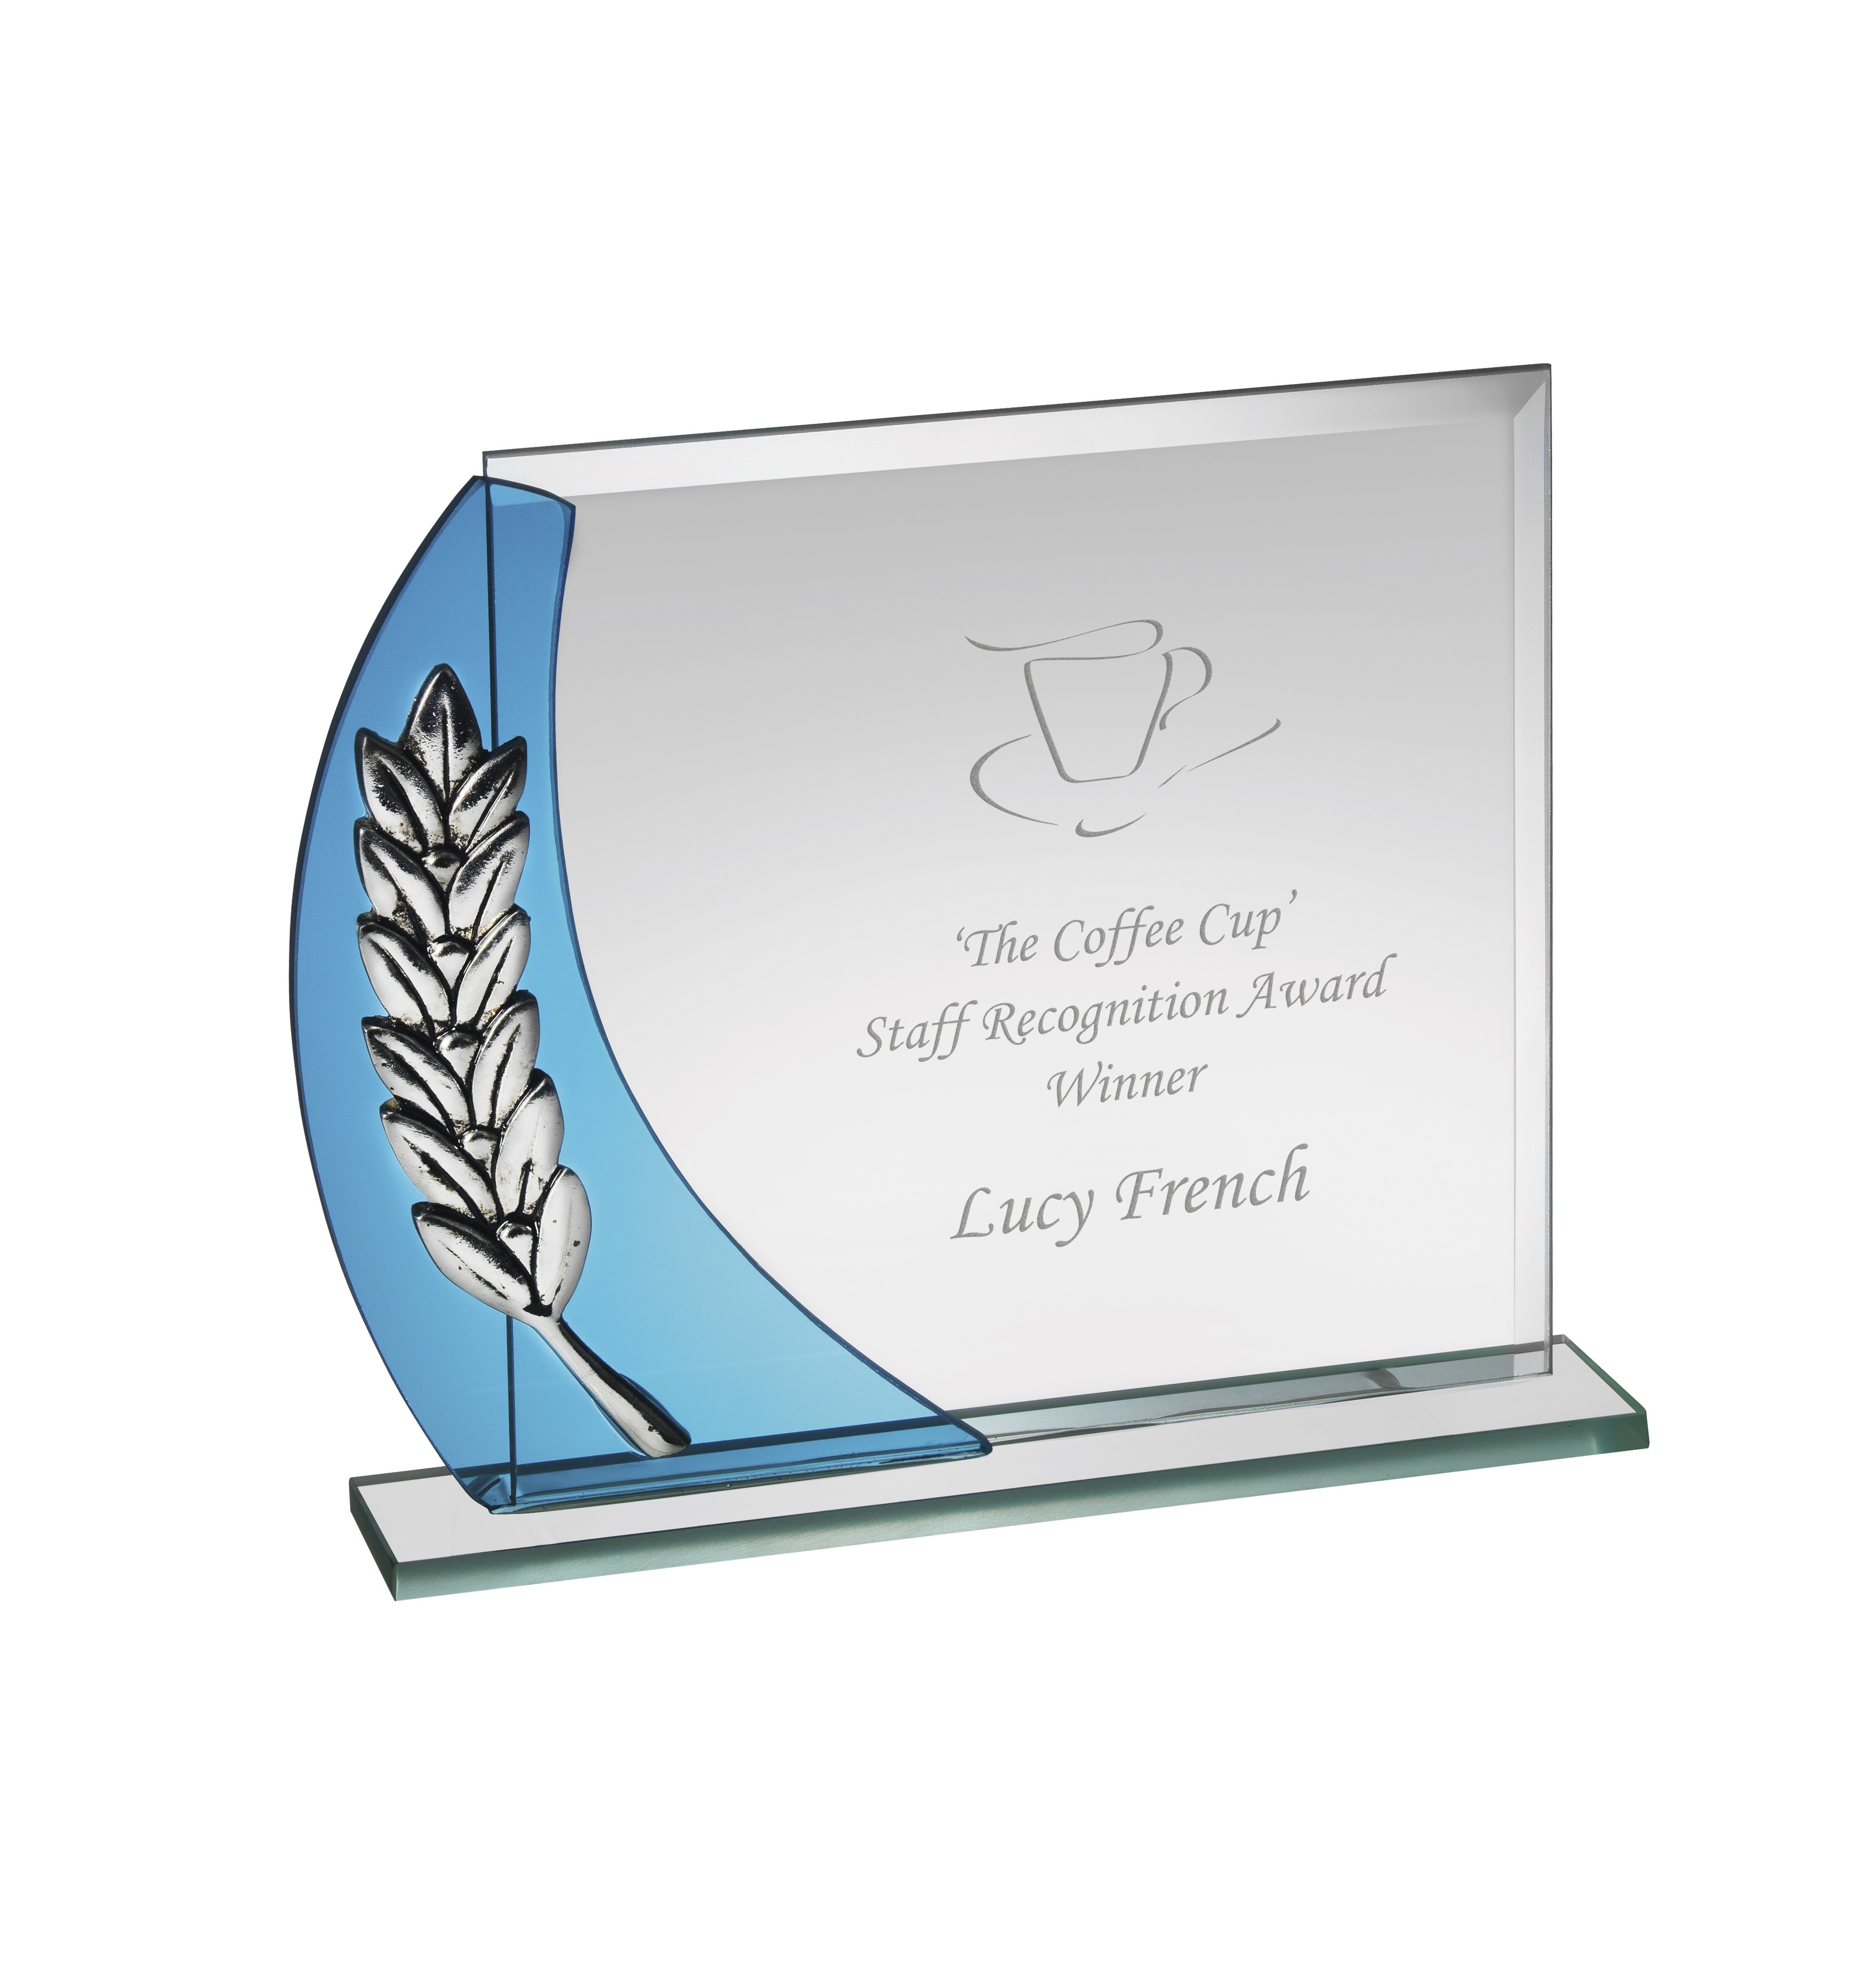 5.75 x 15cm Gls Award with Wreath in Box